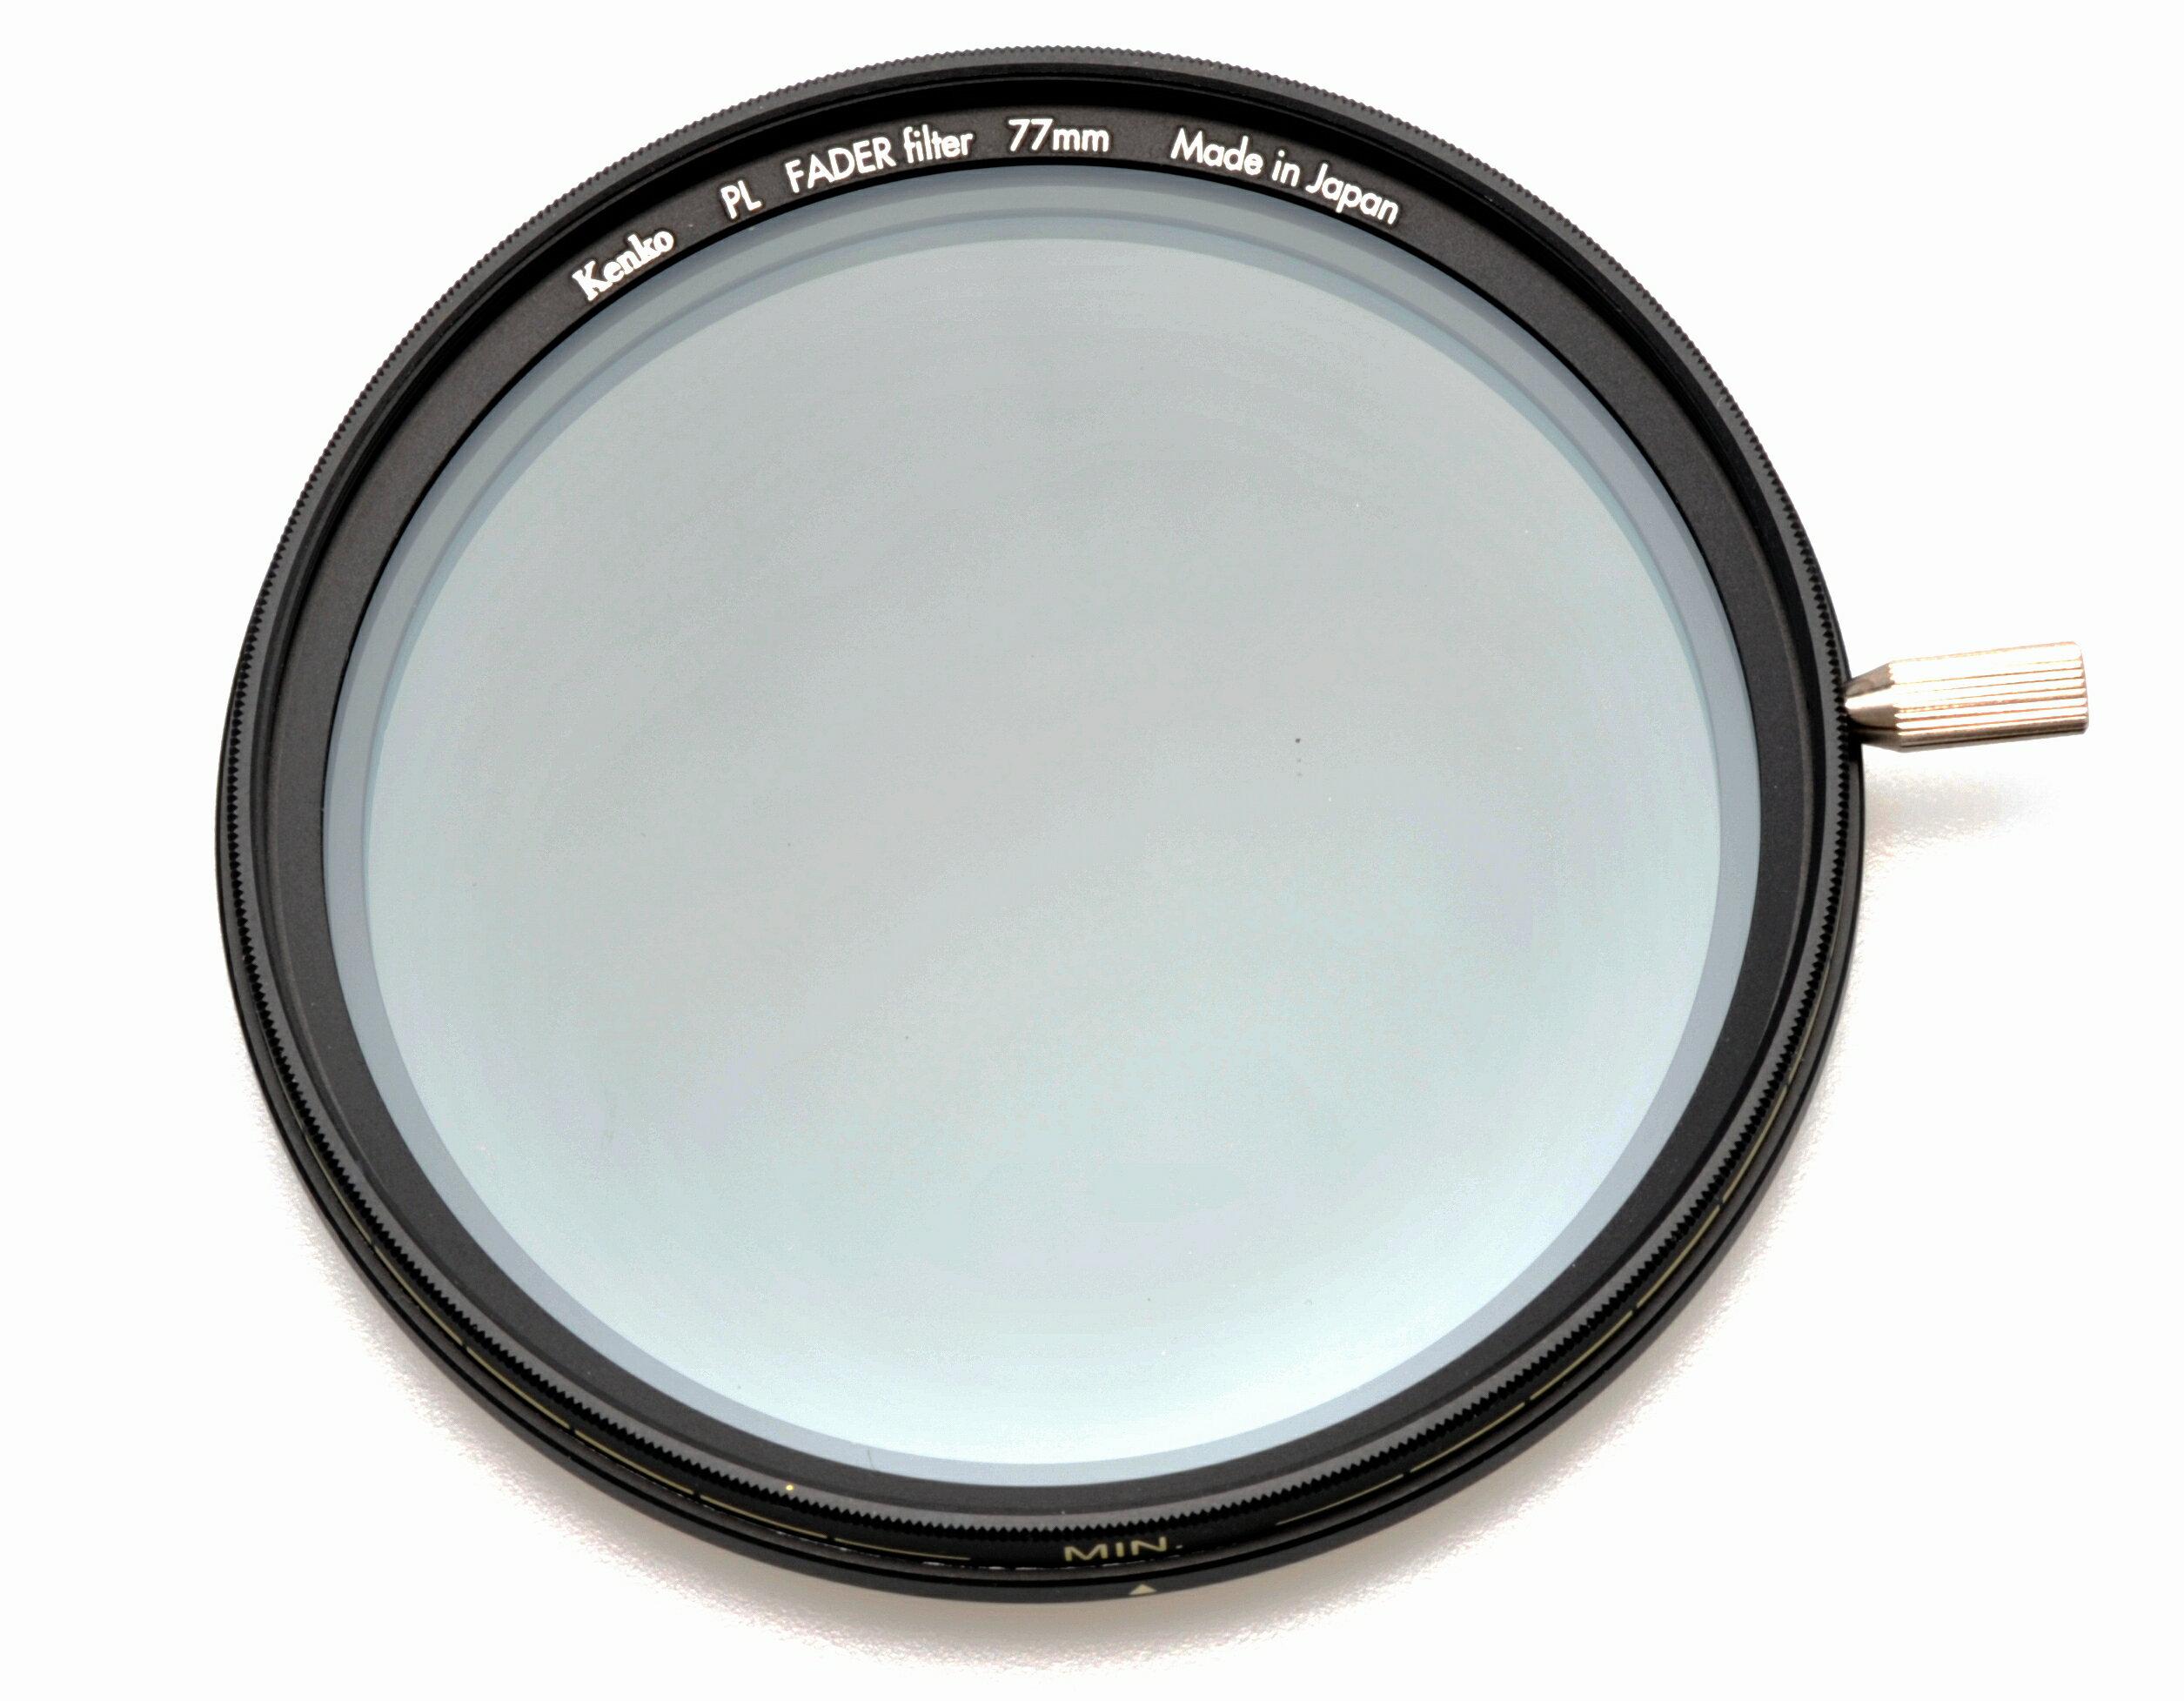 【普羅相機】KENKO PL FADER ND3-ND400 72mm 可調式減光鏡